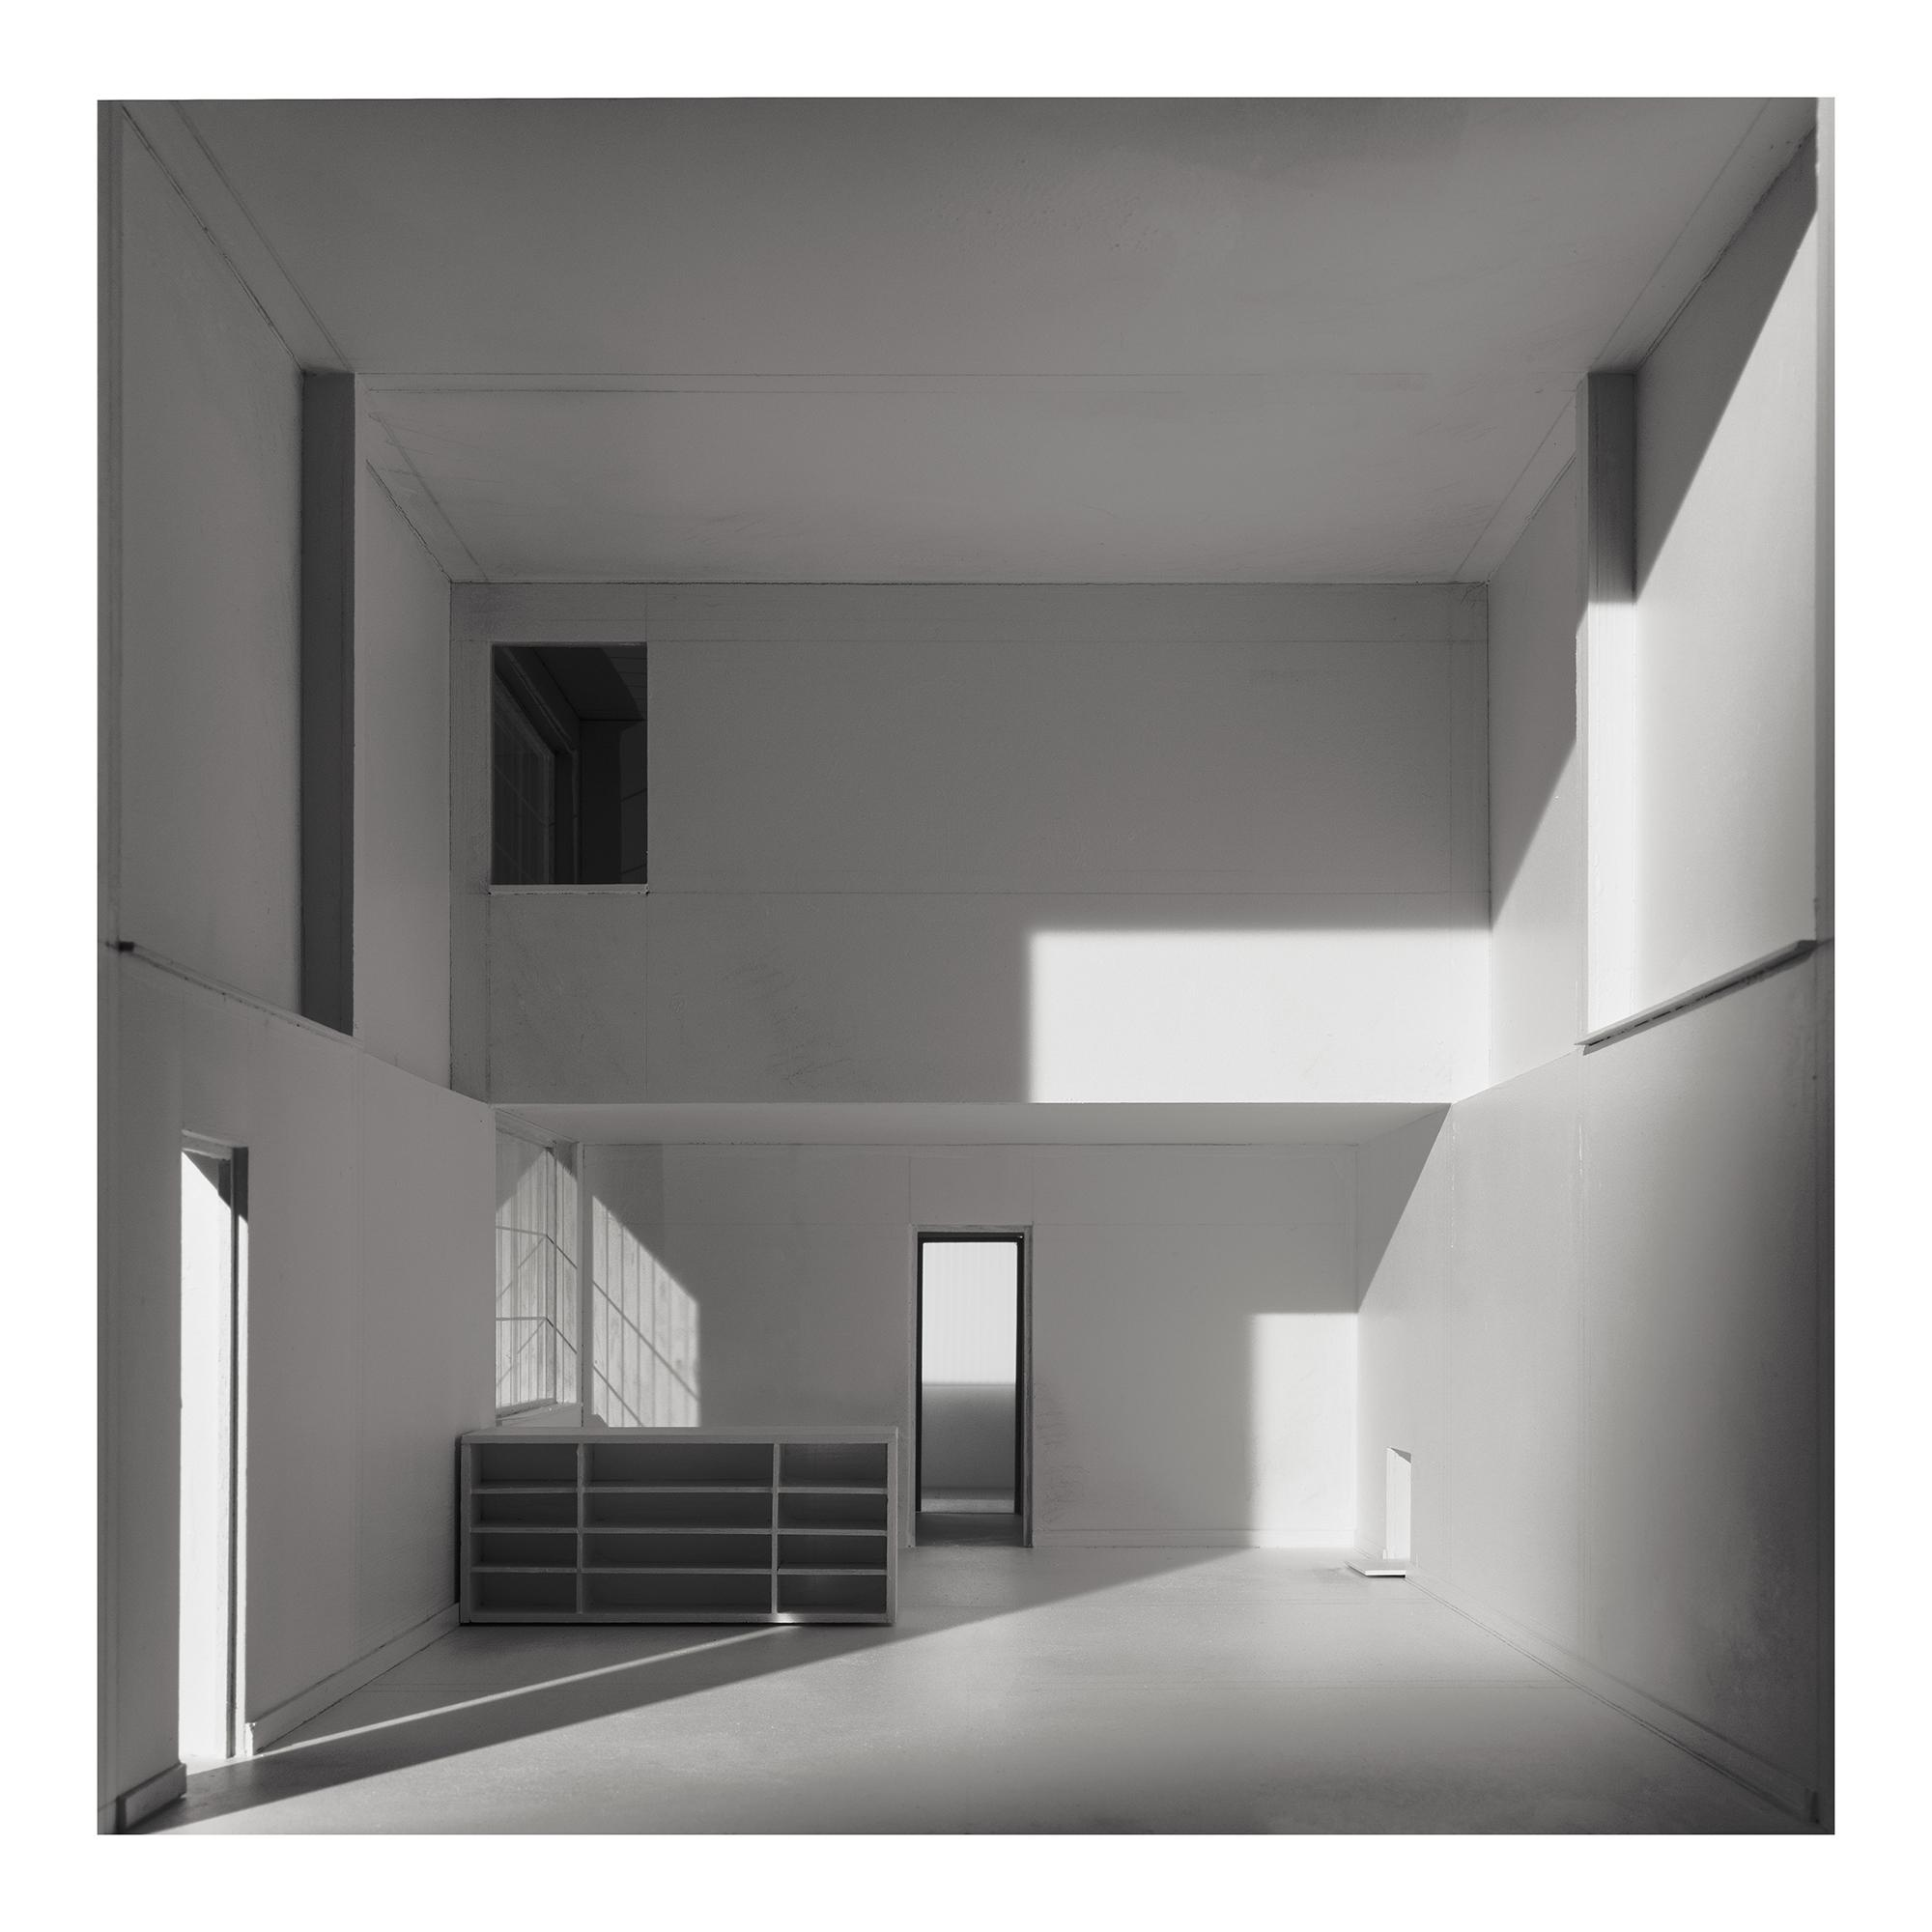 L.h.dc-4 Maison Citrohan. 1920. Le Corbusier. Impresión digital, papel algodón Hahnemühle. 42x42cm. Edición 5.